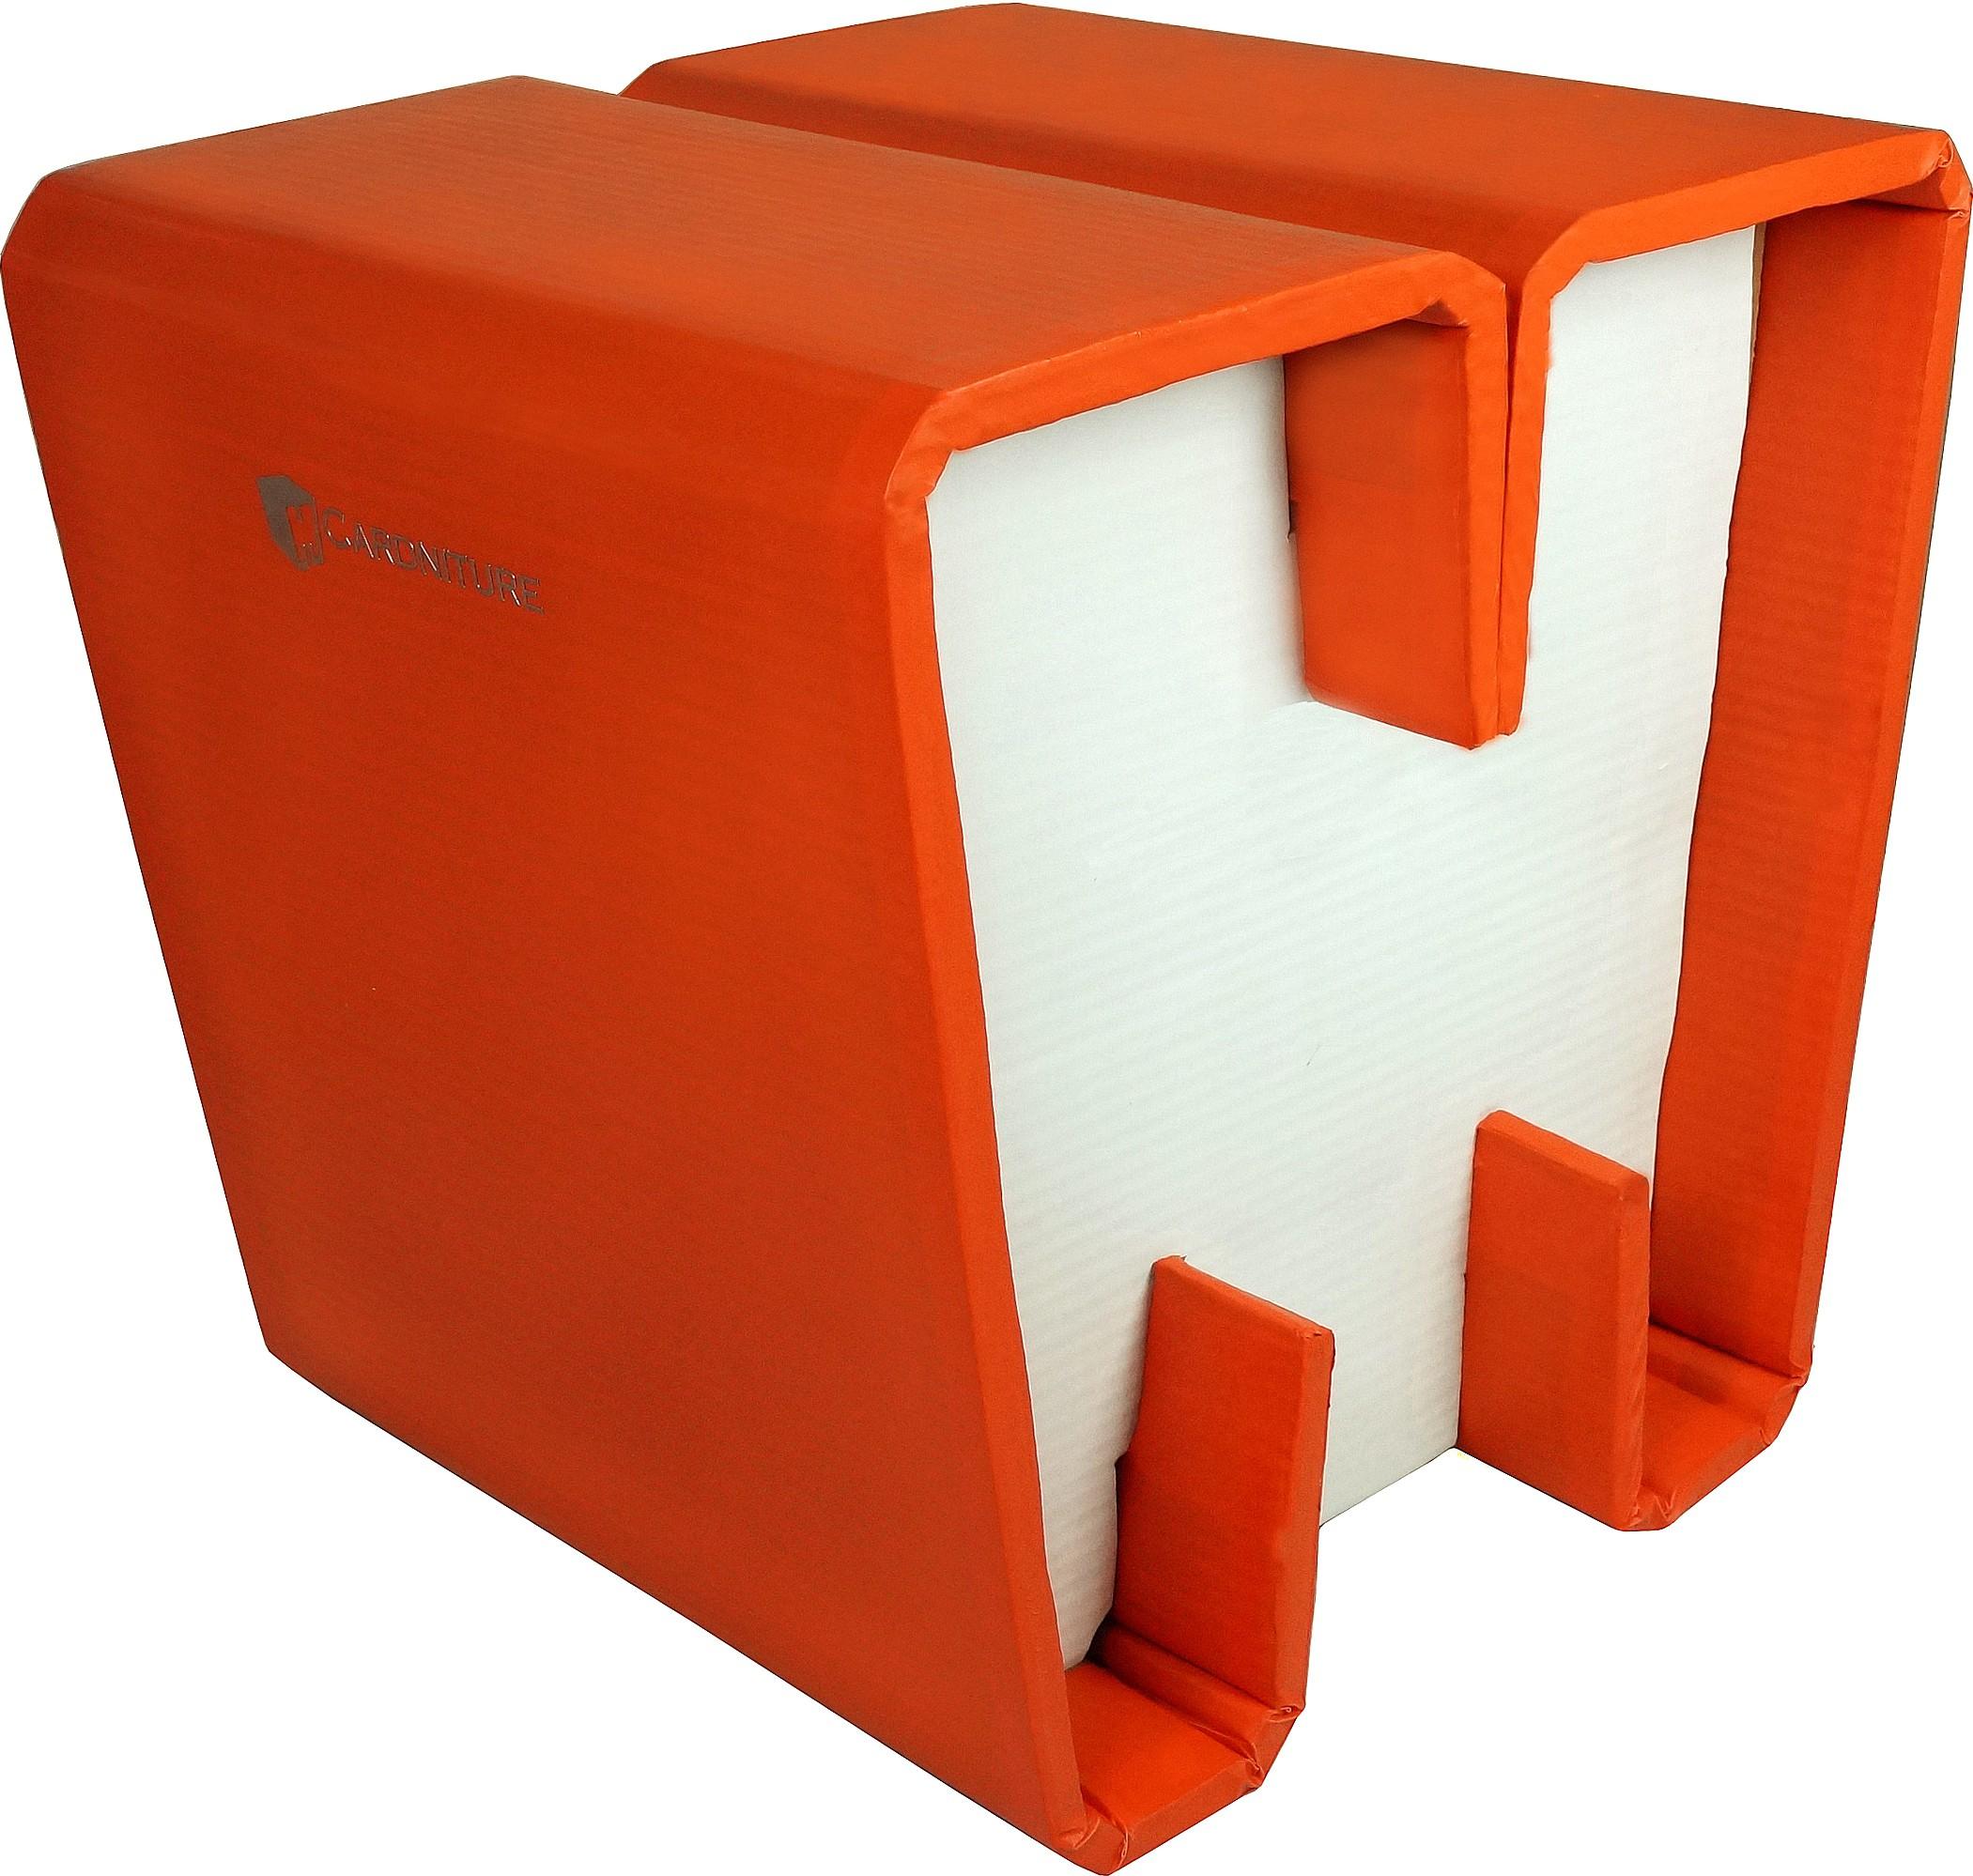 View Cardniture ZING Living & Bedroom Stool(Orange, White) Furniture (Cardniture)